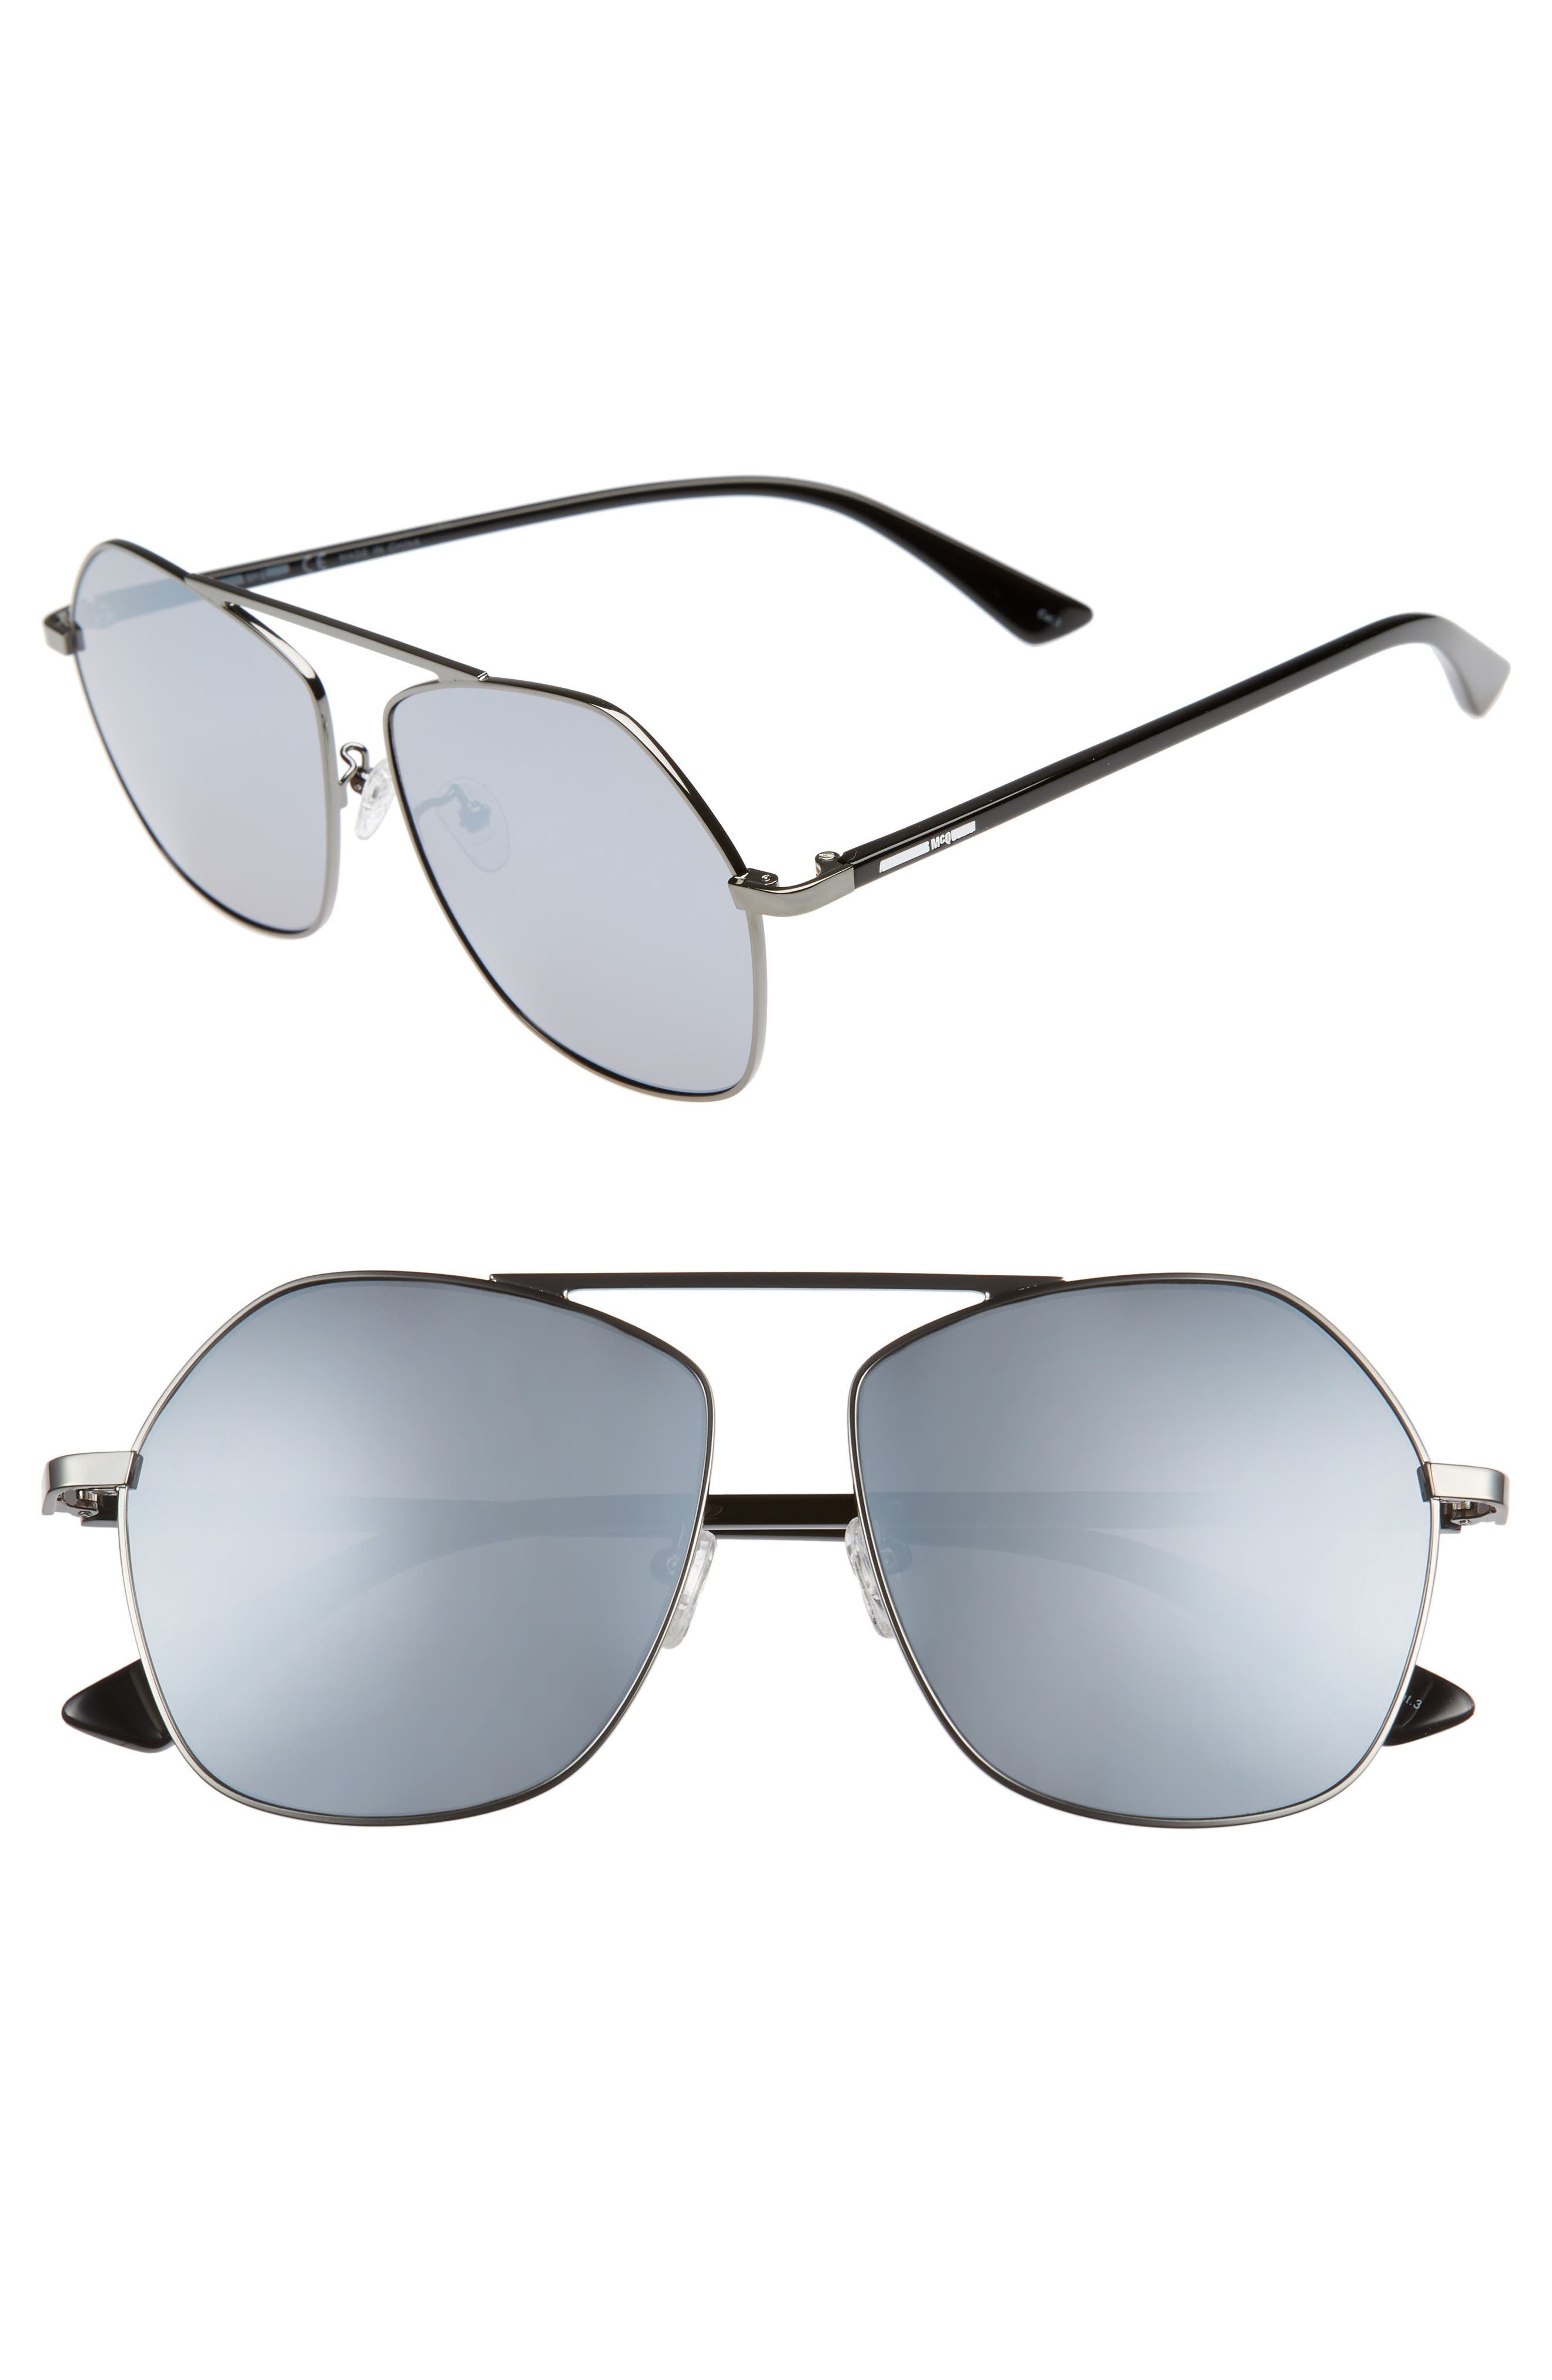 McQ Alexander McQueen 59mm Aviator Sunglasses